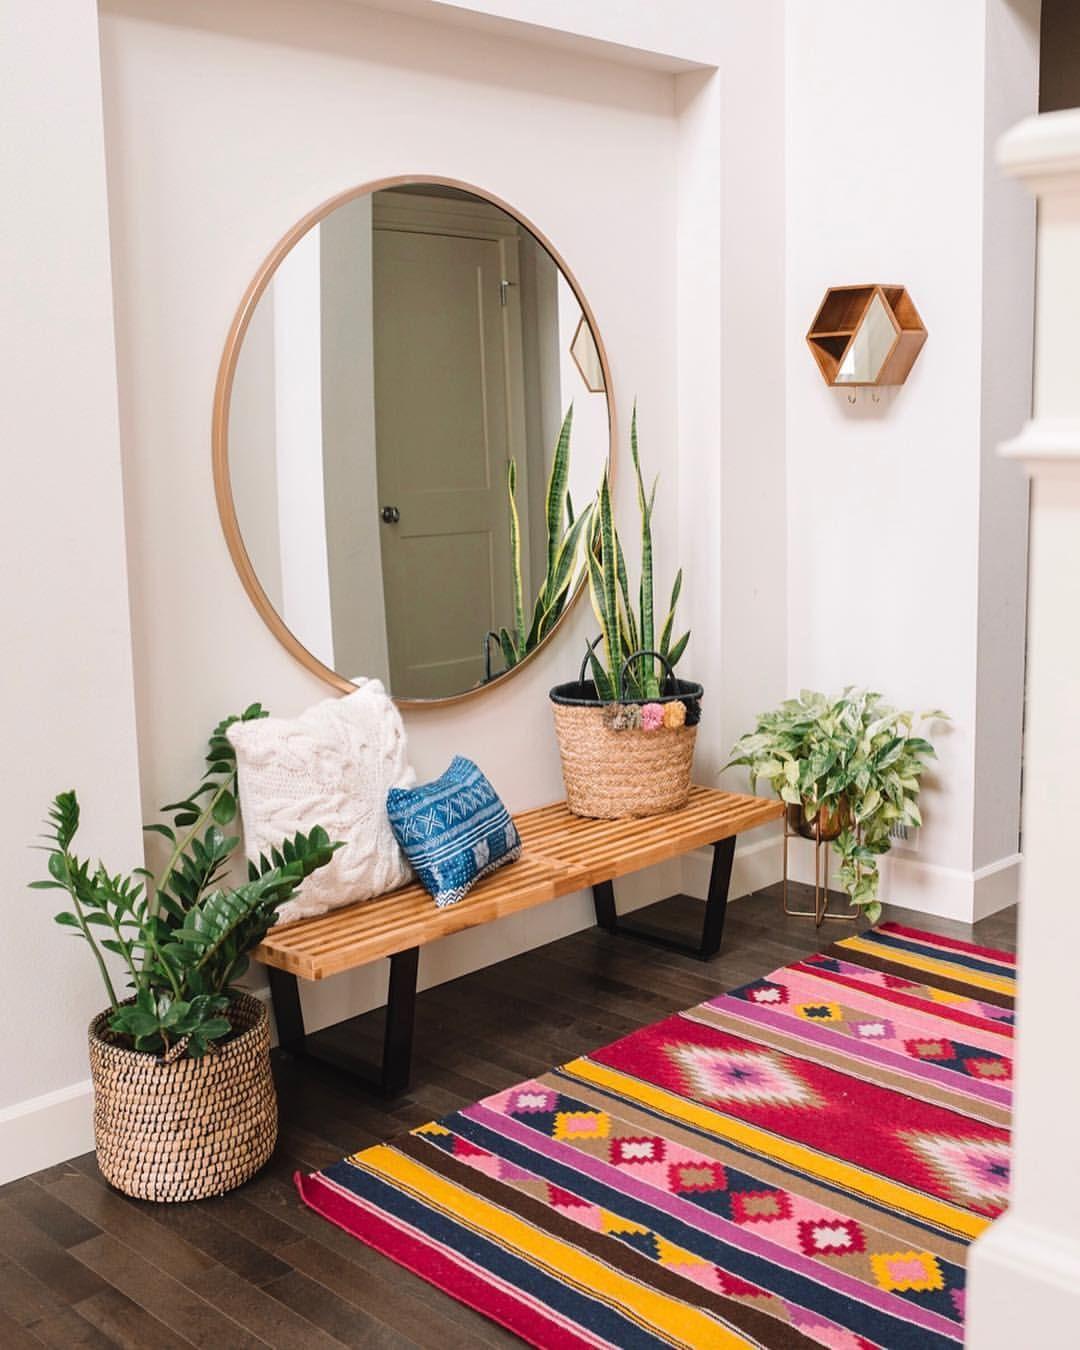 Small Apartment Living Room Decor Ideas Color Foyer: Pin By Sarah Cisz On Home Decor